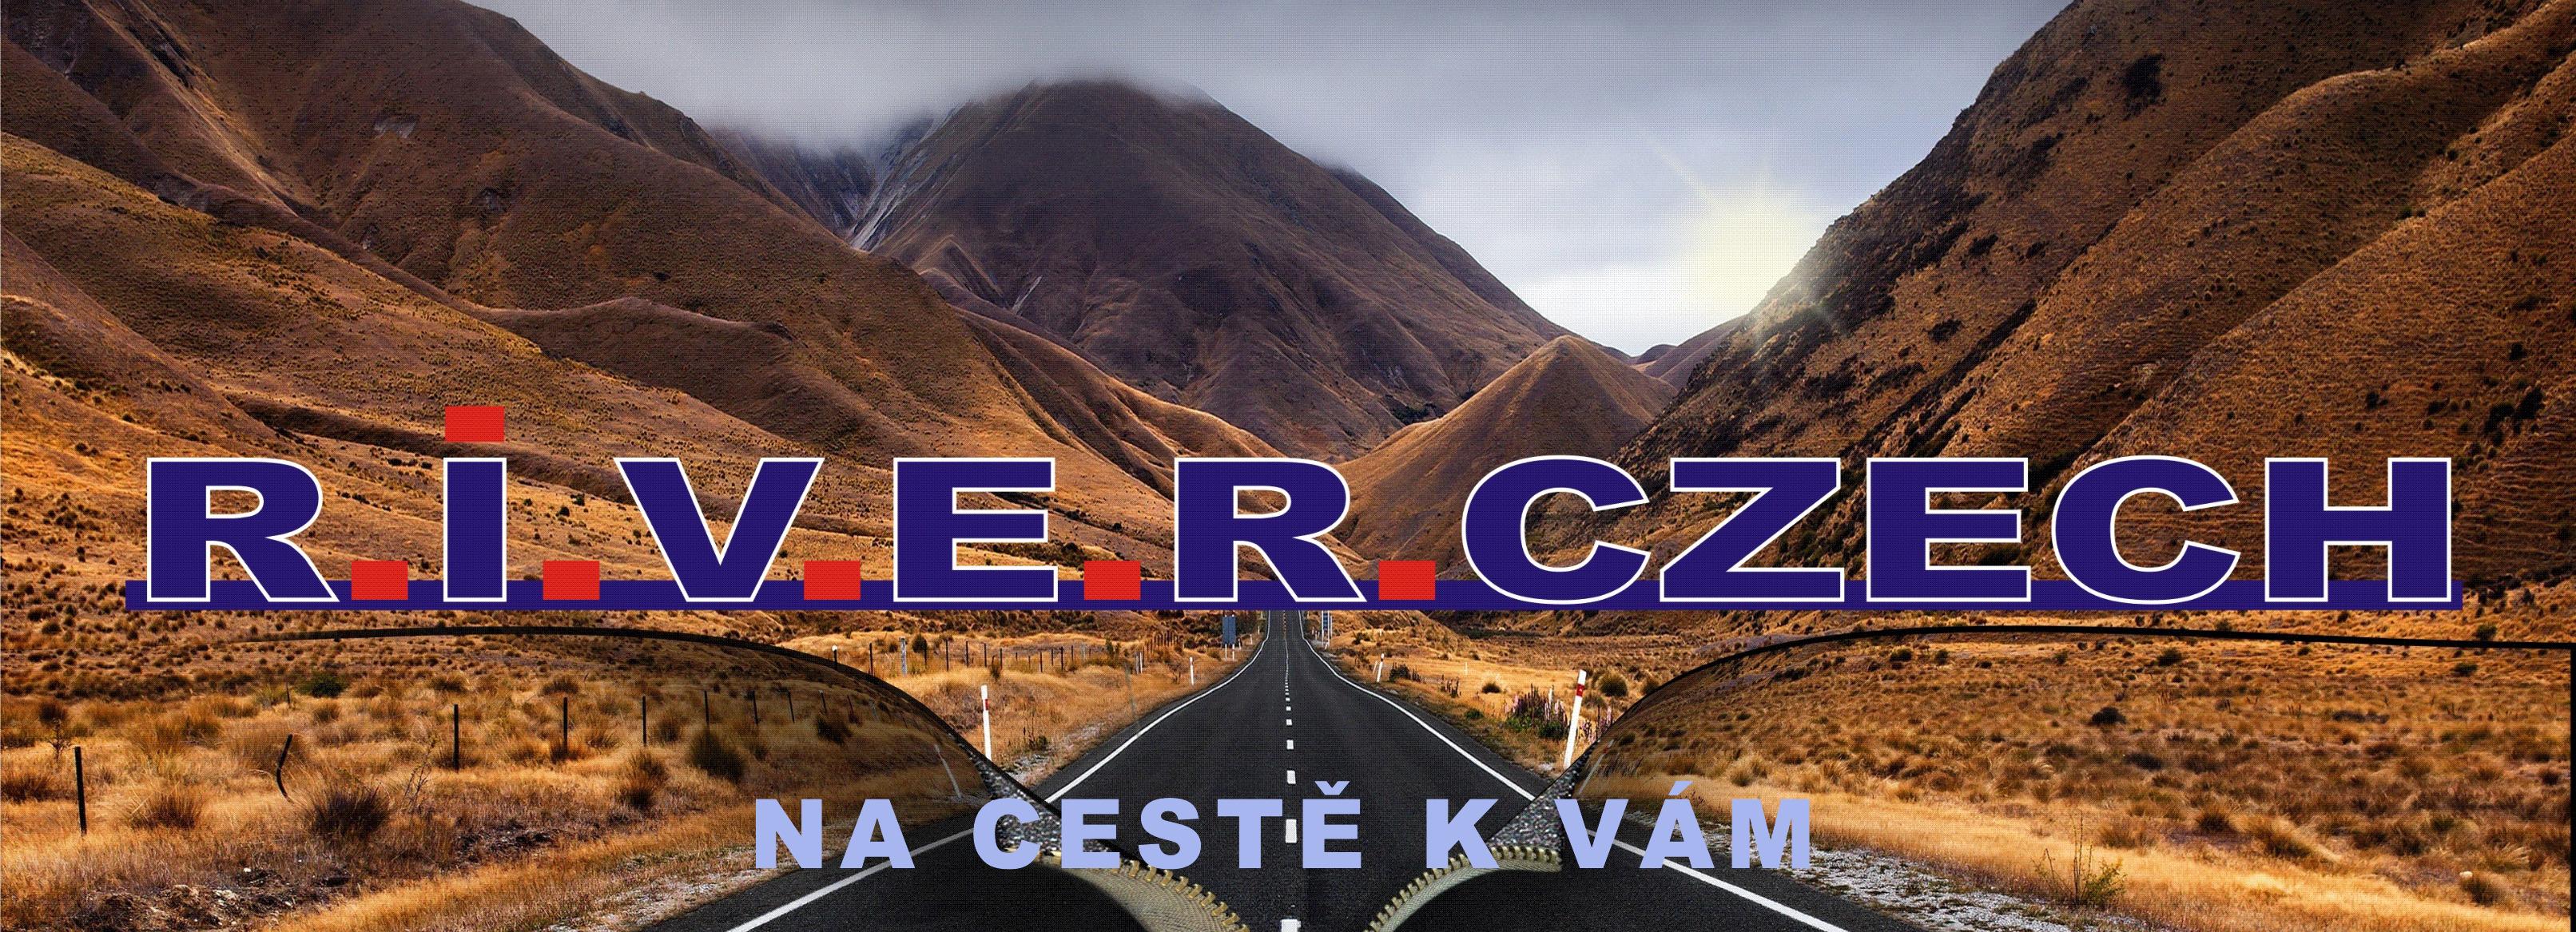 logo firmy RiverCzech